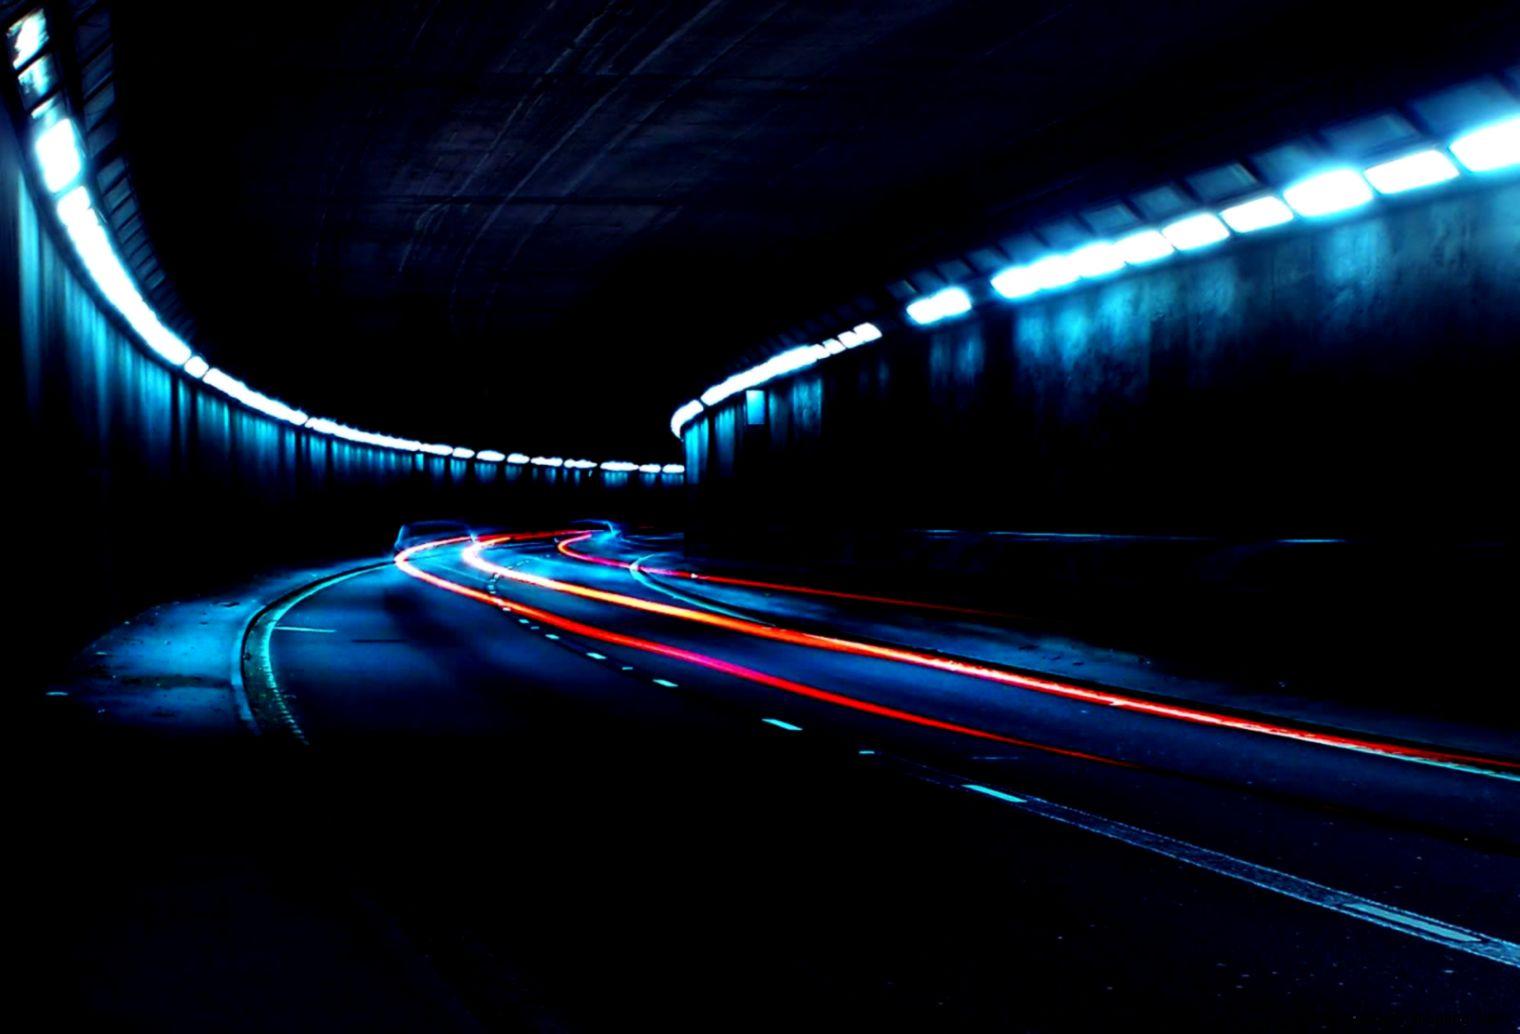 Need for speed wallpaper best hd wallpapers - Speed wallpaper ...